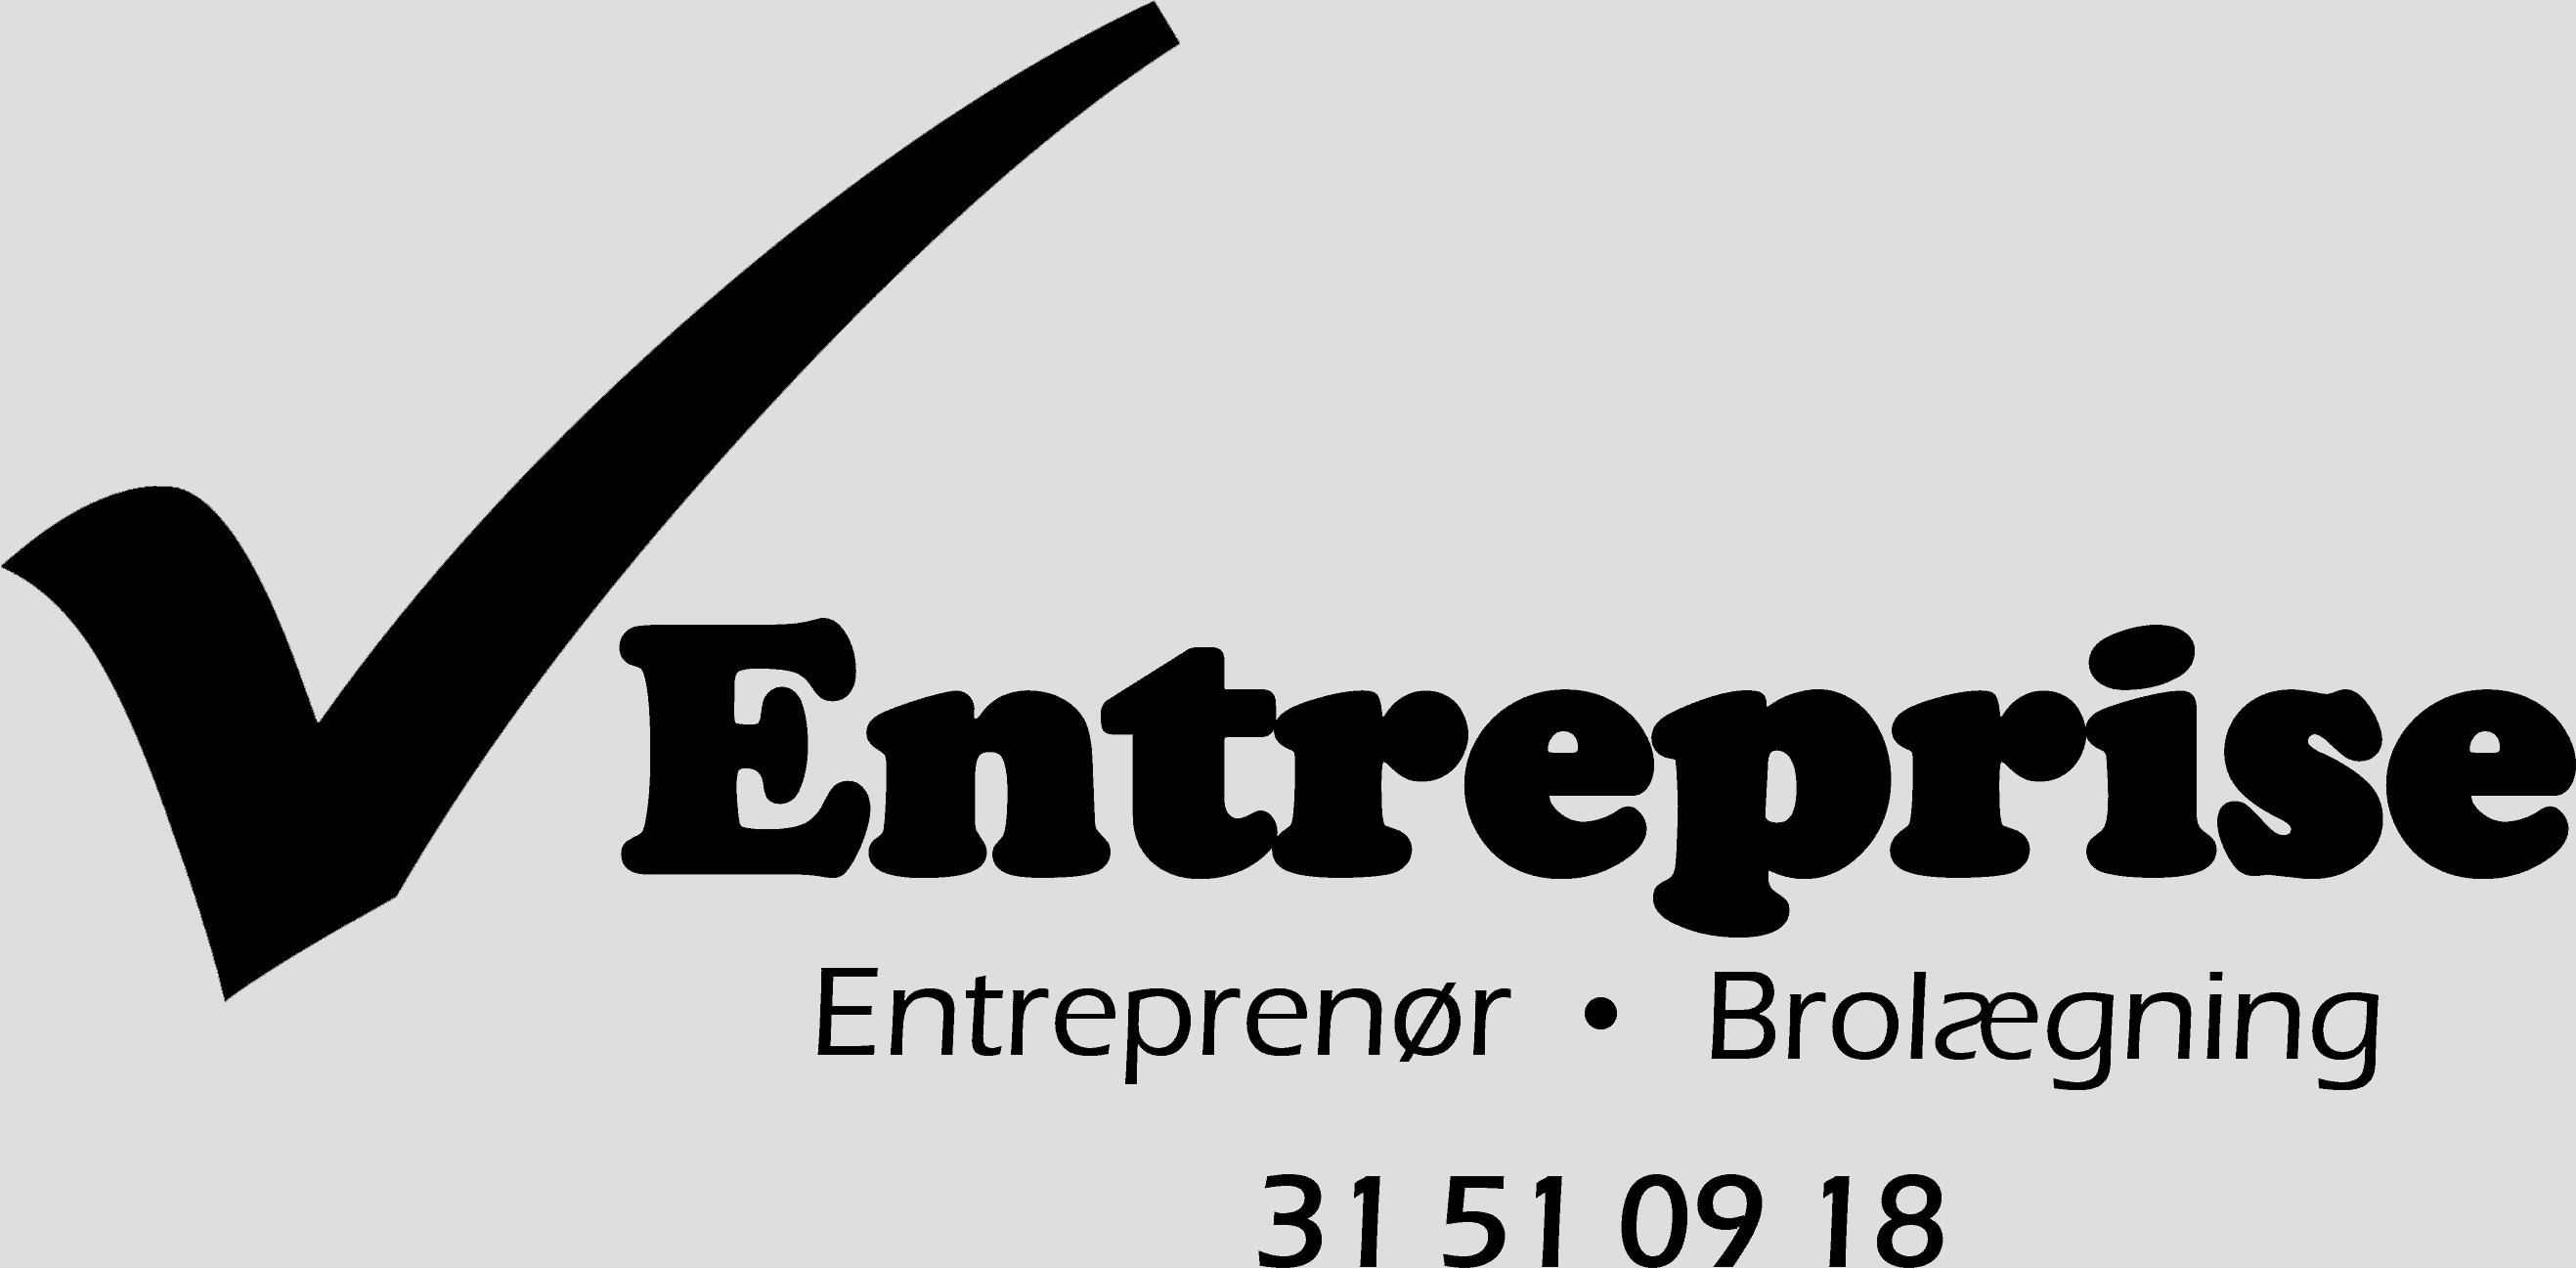 V Entreprise